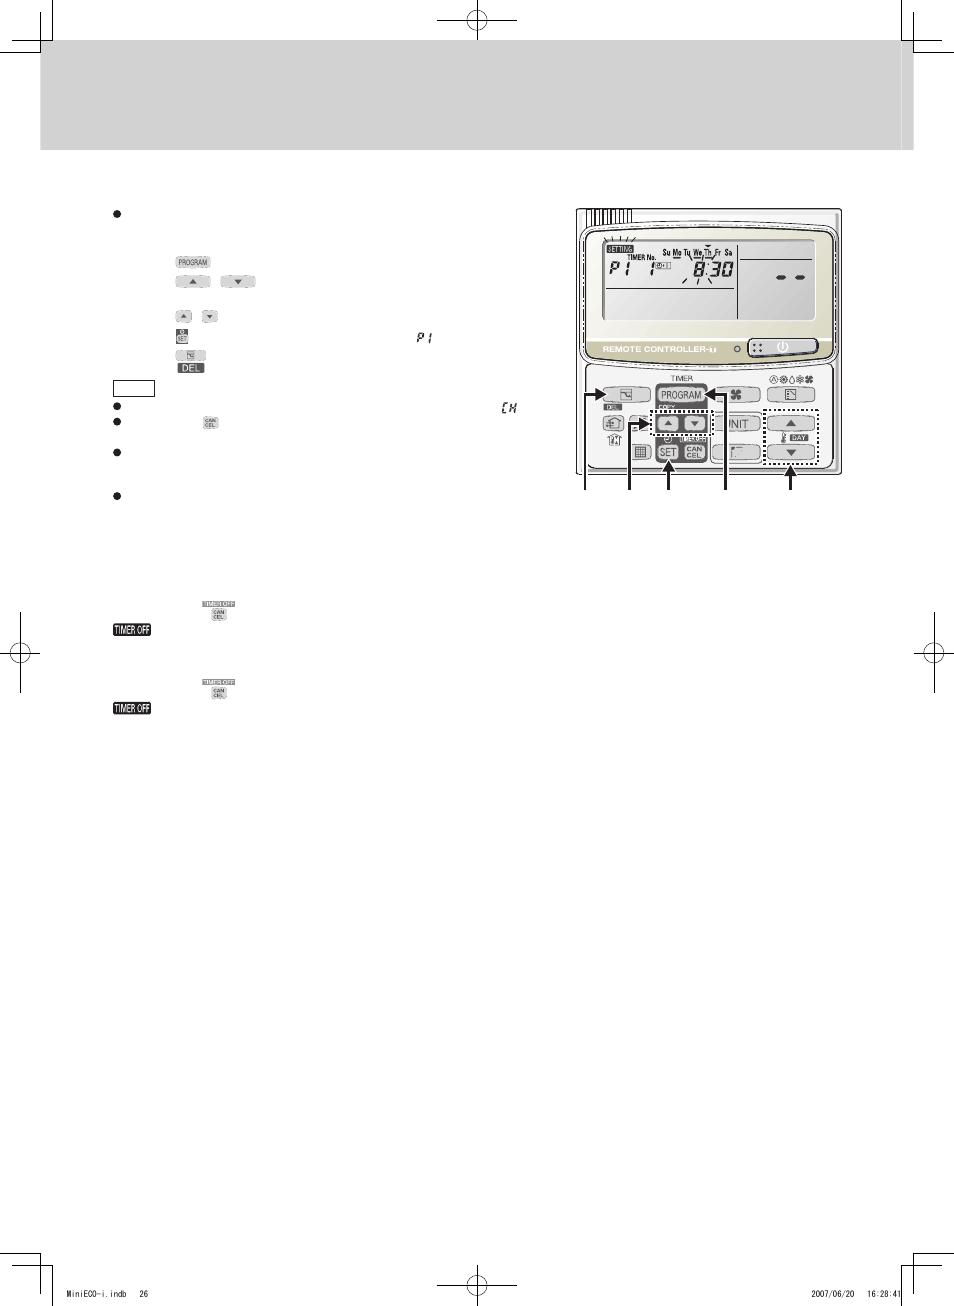 timer remote controller rcs tm80bg sanyo chx06052 user manual rh manualsdir com Procedure Manual Procedure Manual